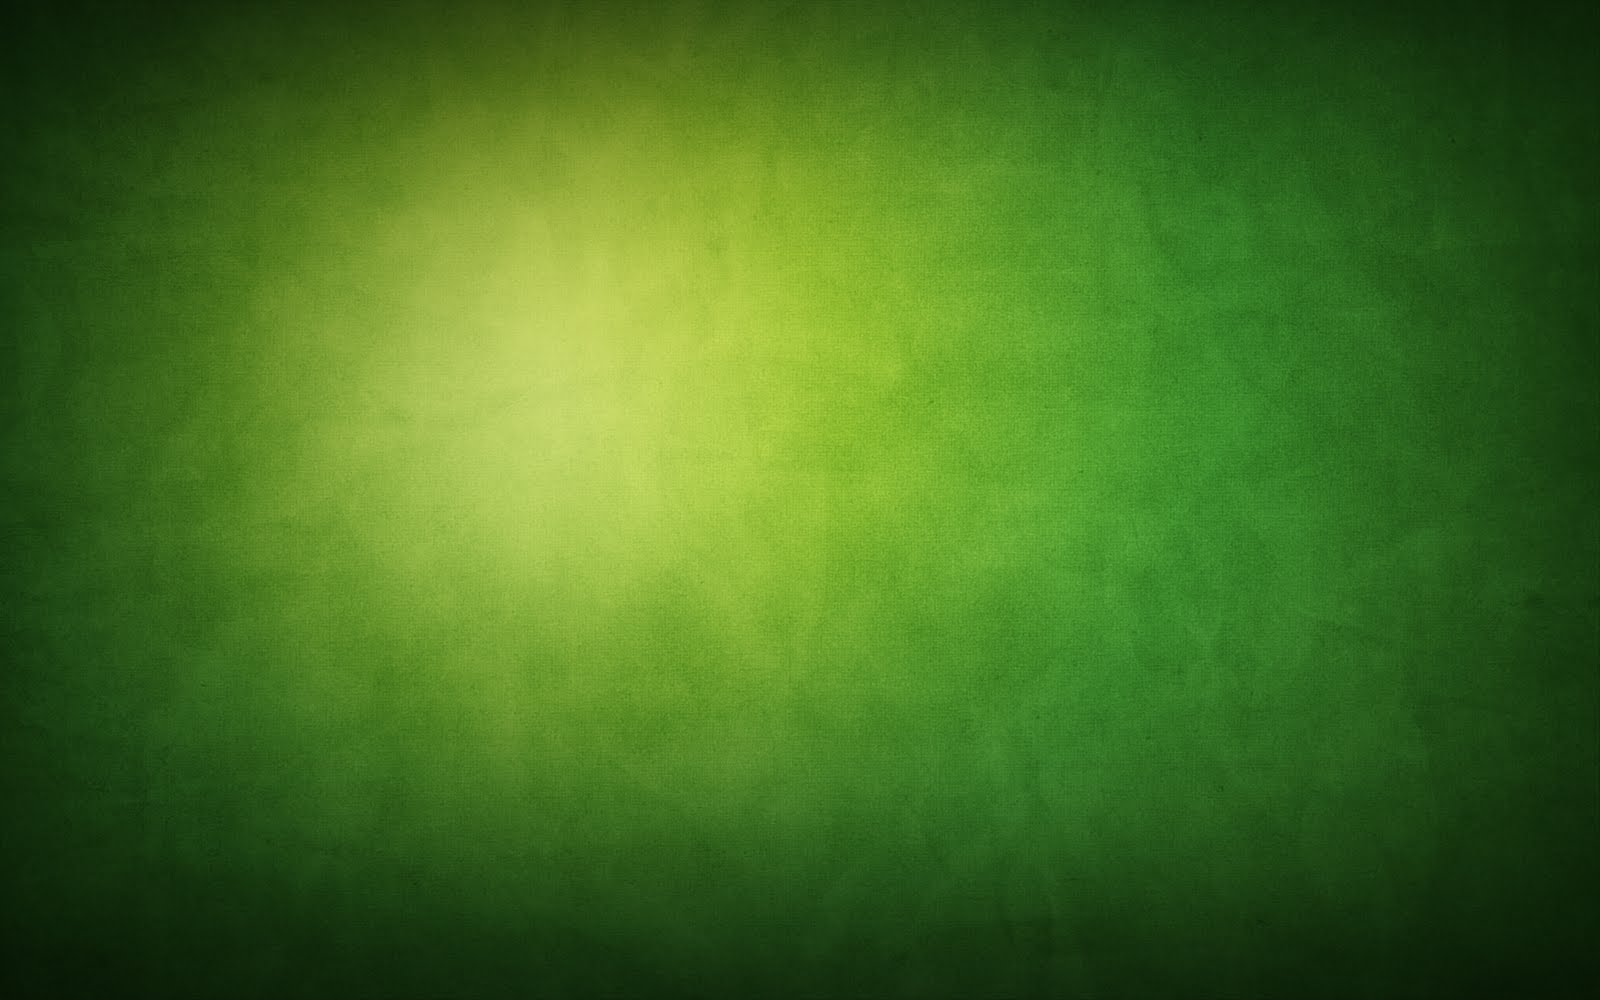 Download Texture Green Wall Wallpaper 1600x1000 Full HD Wallpapers 1600x1000